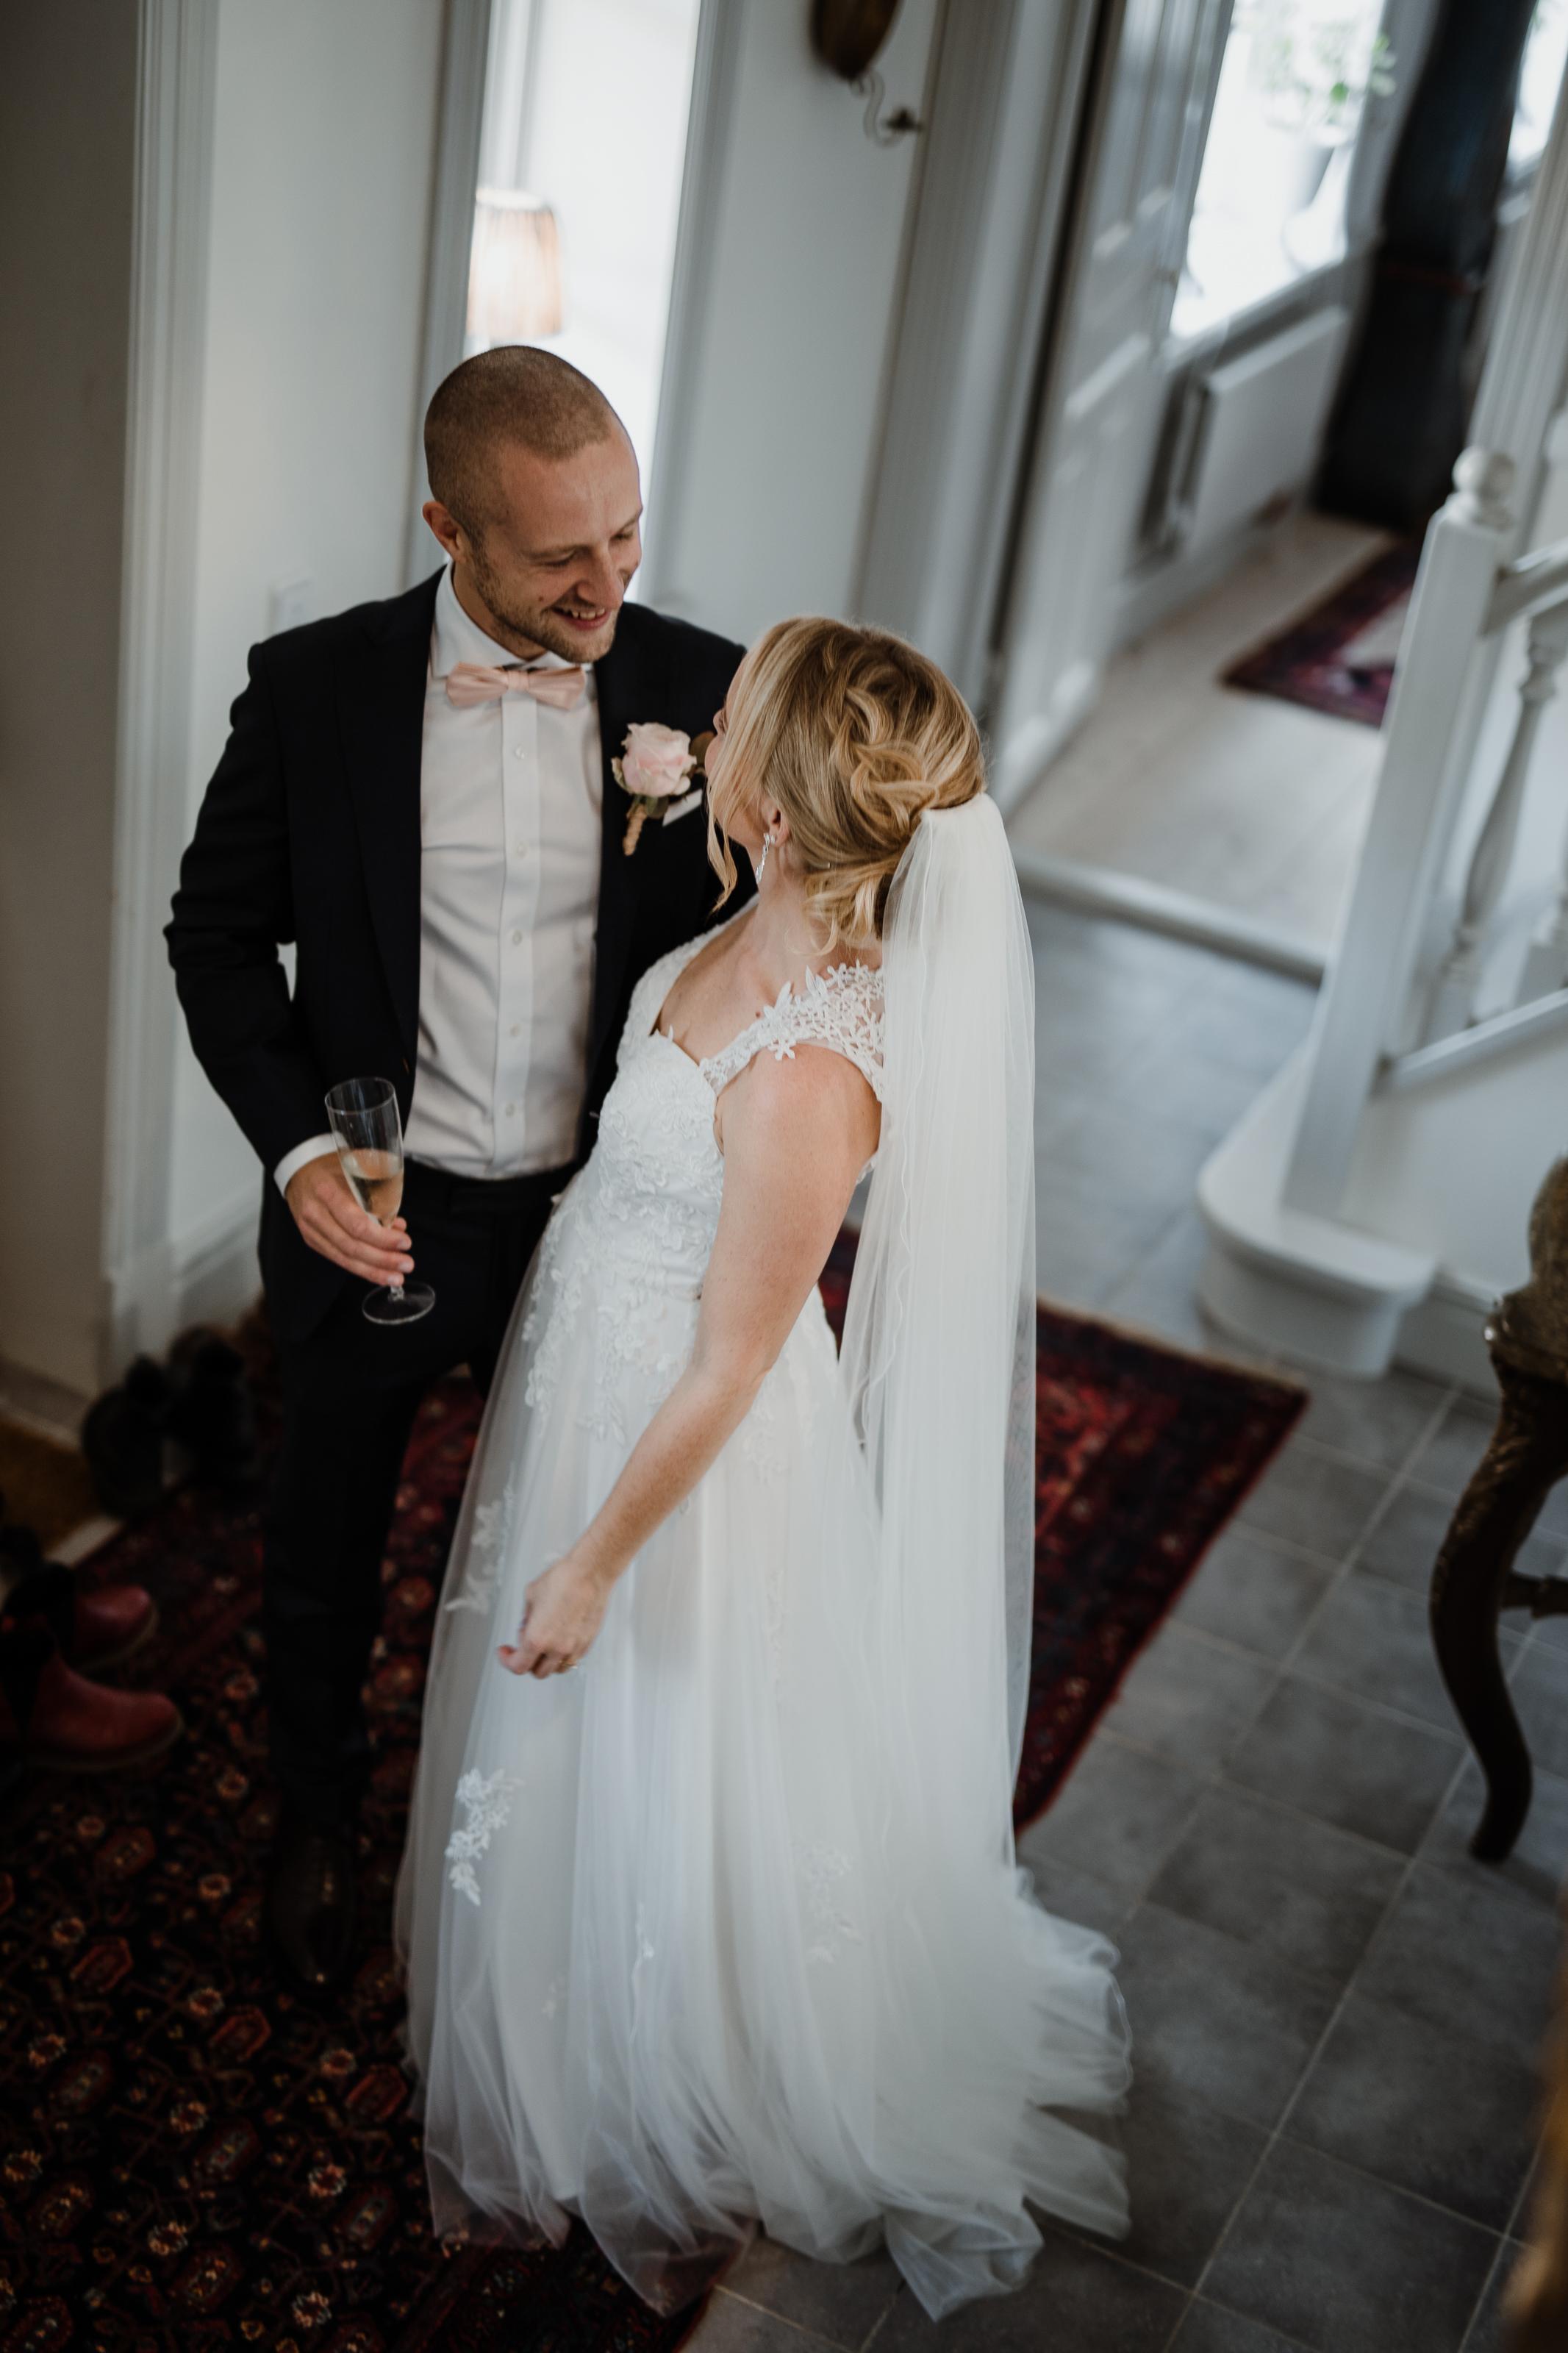 Bröllopsfotograf-Uddetorp Säteri-Höstbröllop-Fotograf Emilia- Bröllopsfotograf Borås-15.jpg